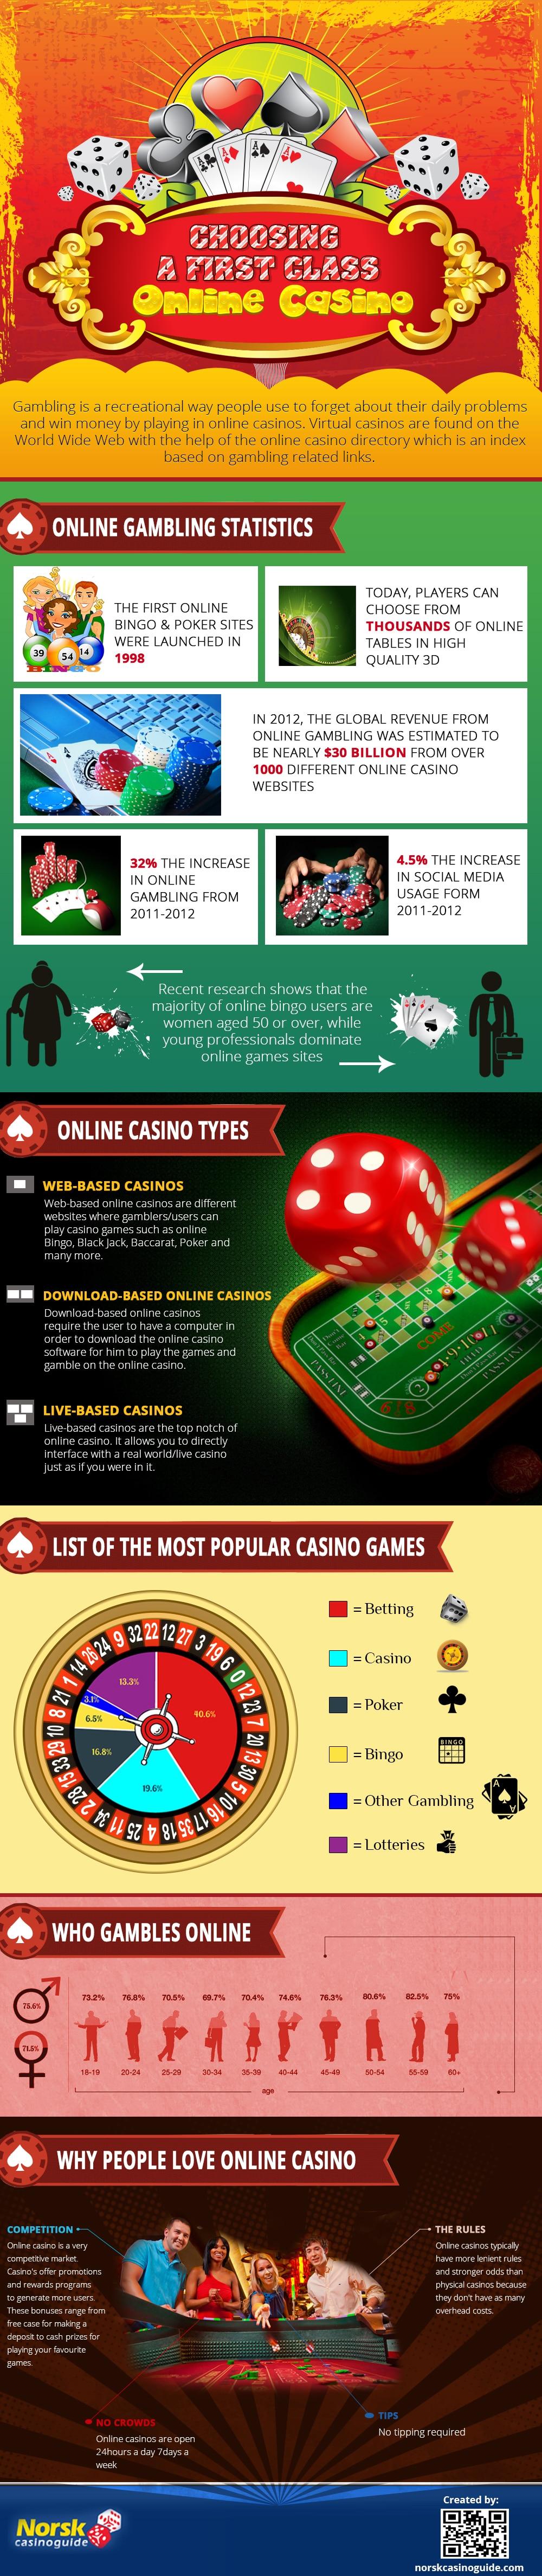 online-gaming-online-casino